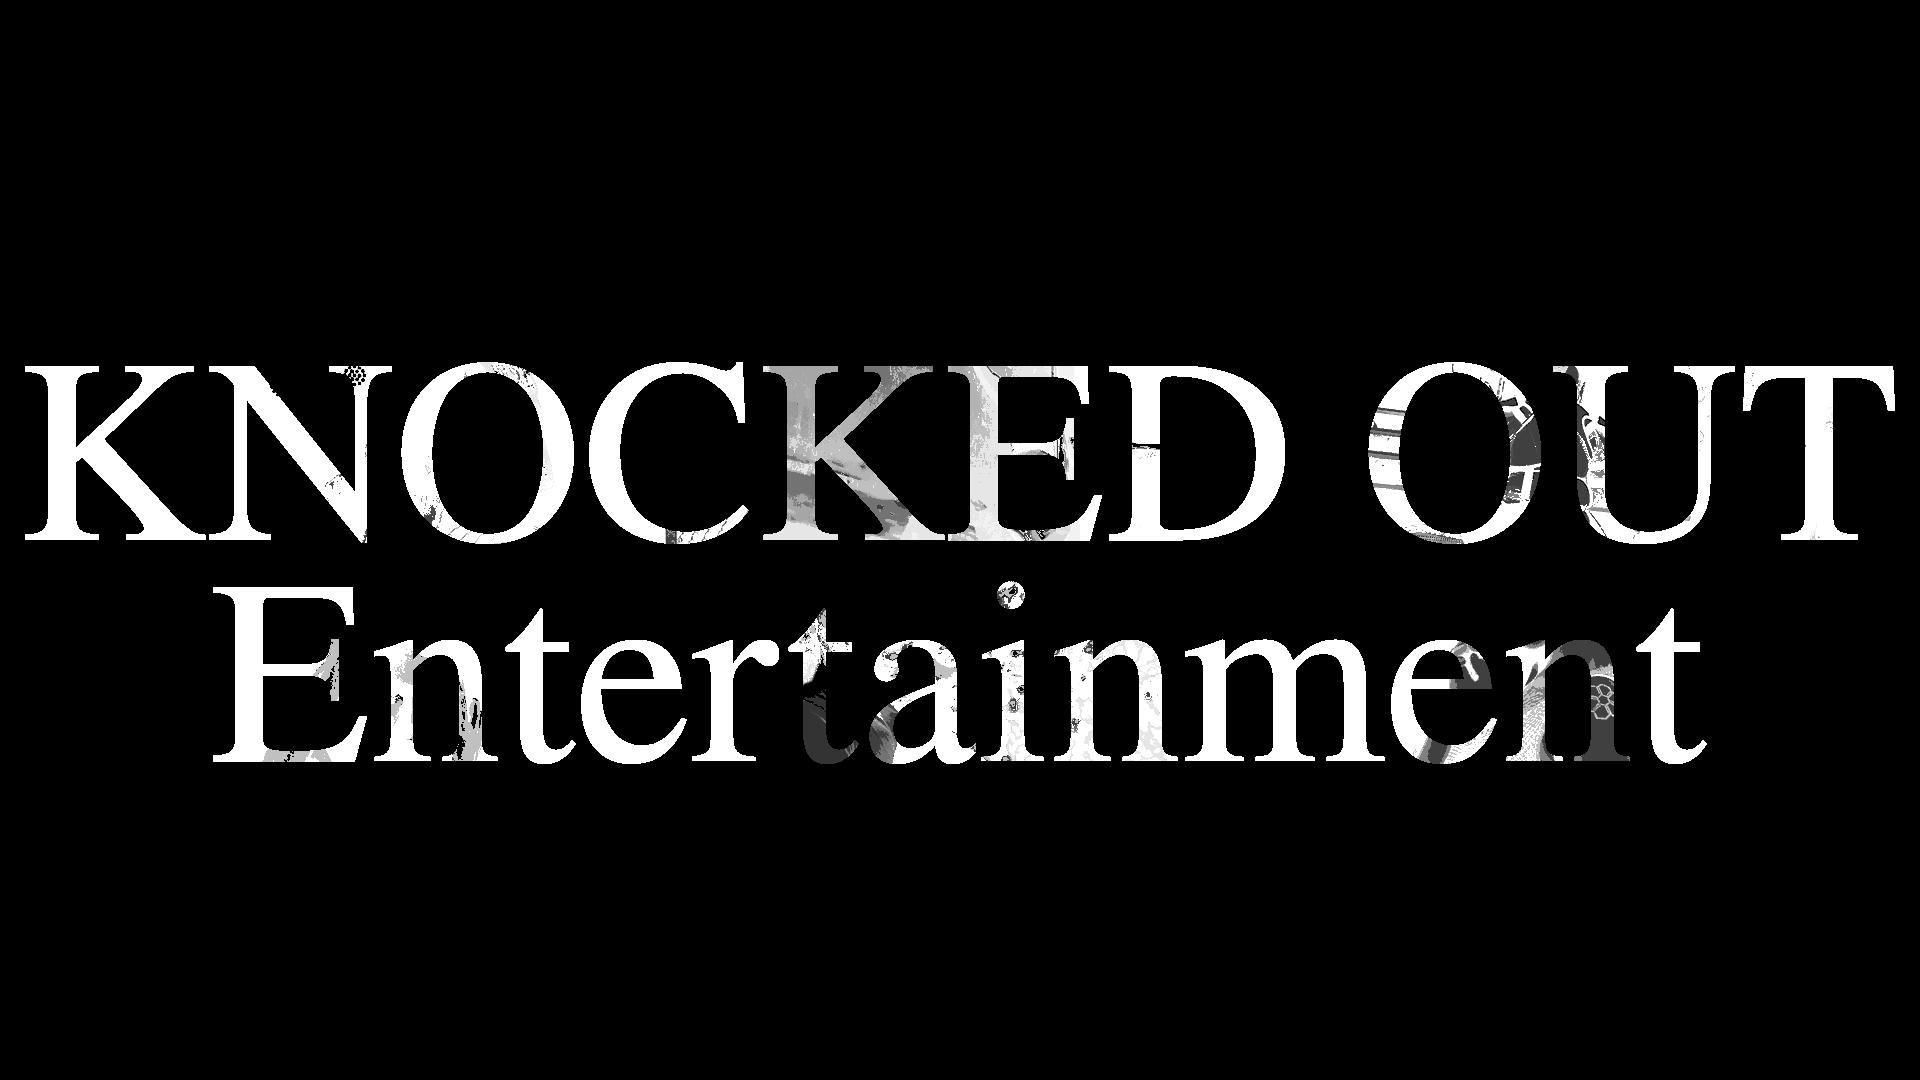 Knocked Out Entertainment Logo 2018.jpg